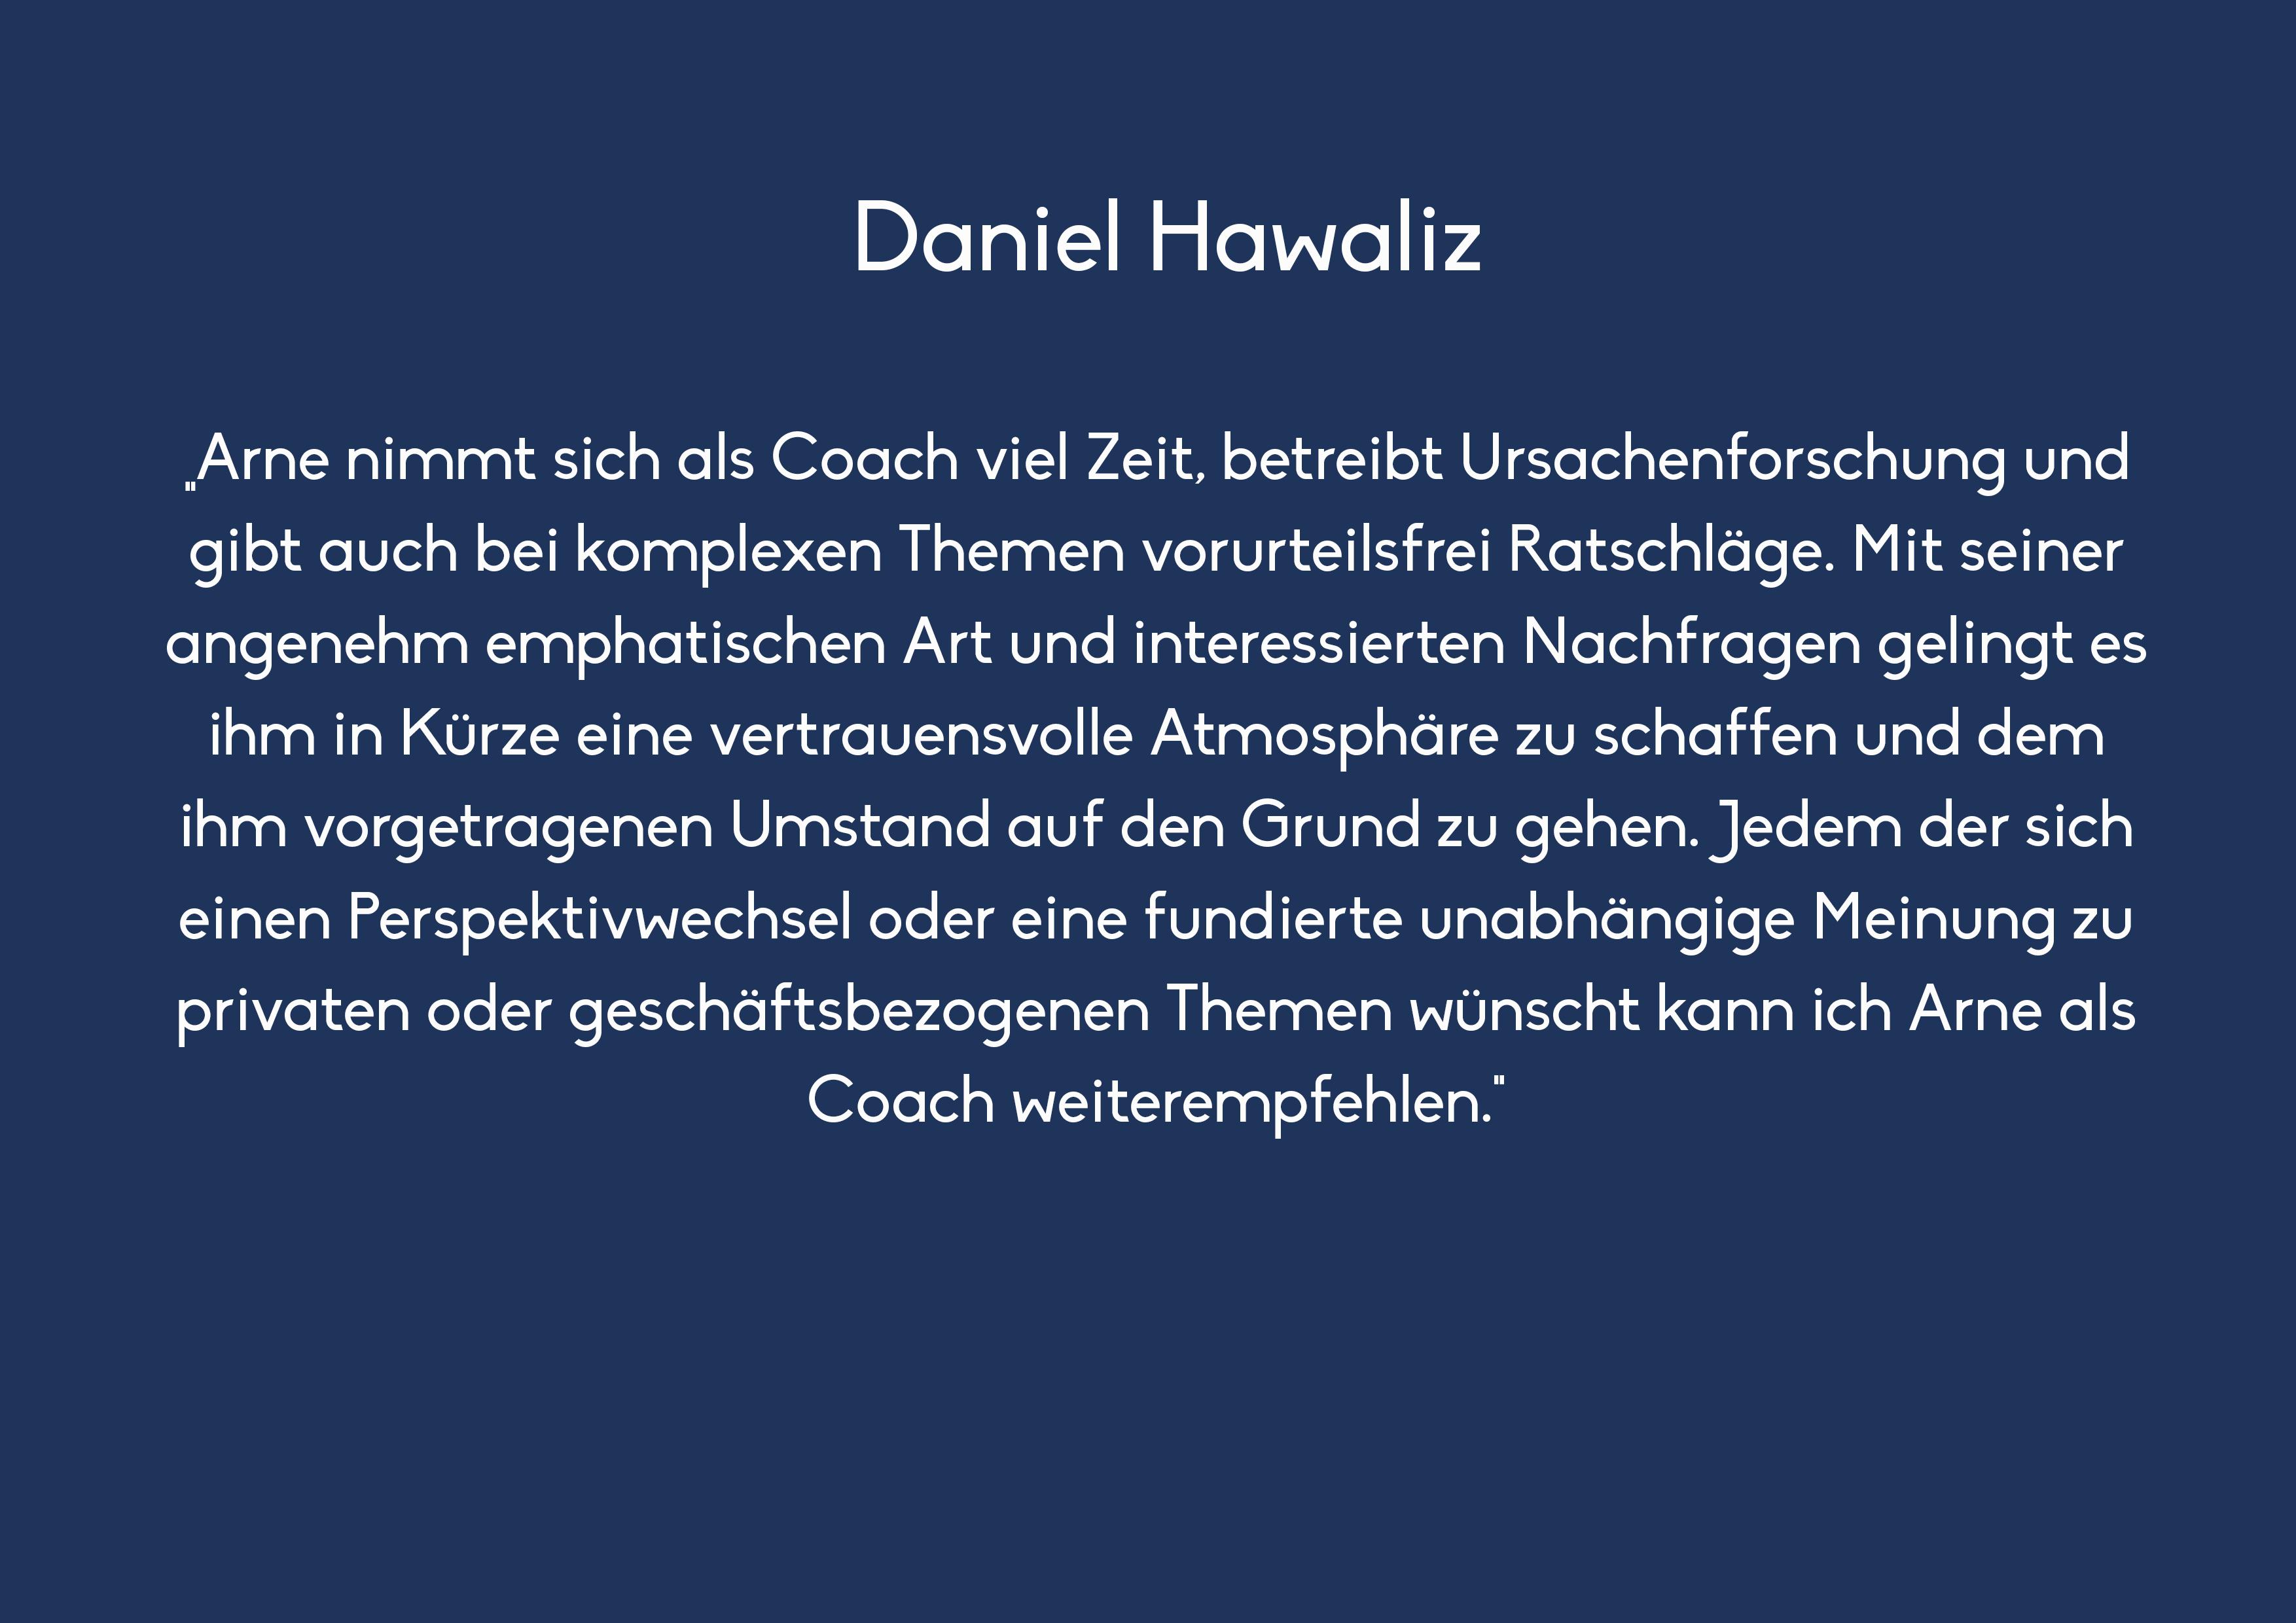 Daniel Hawaliz